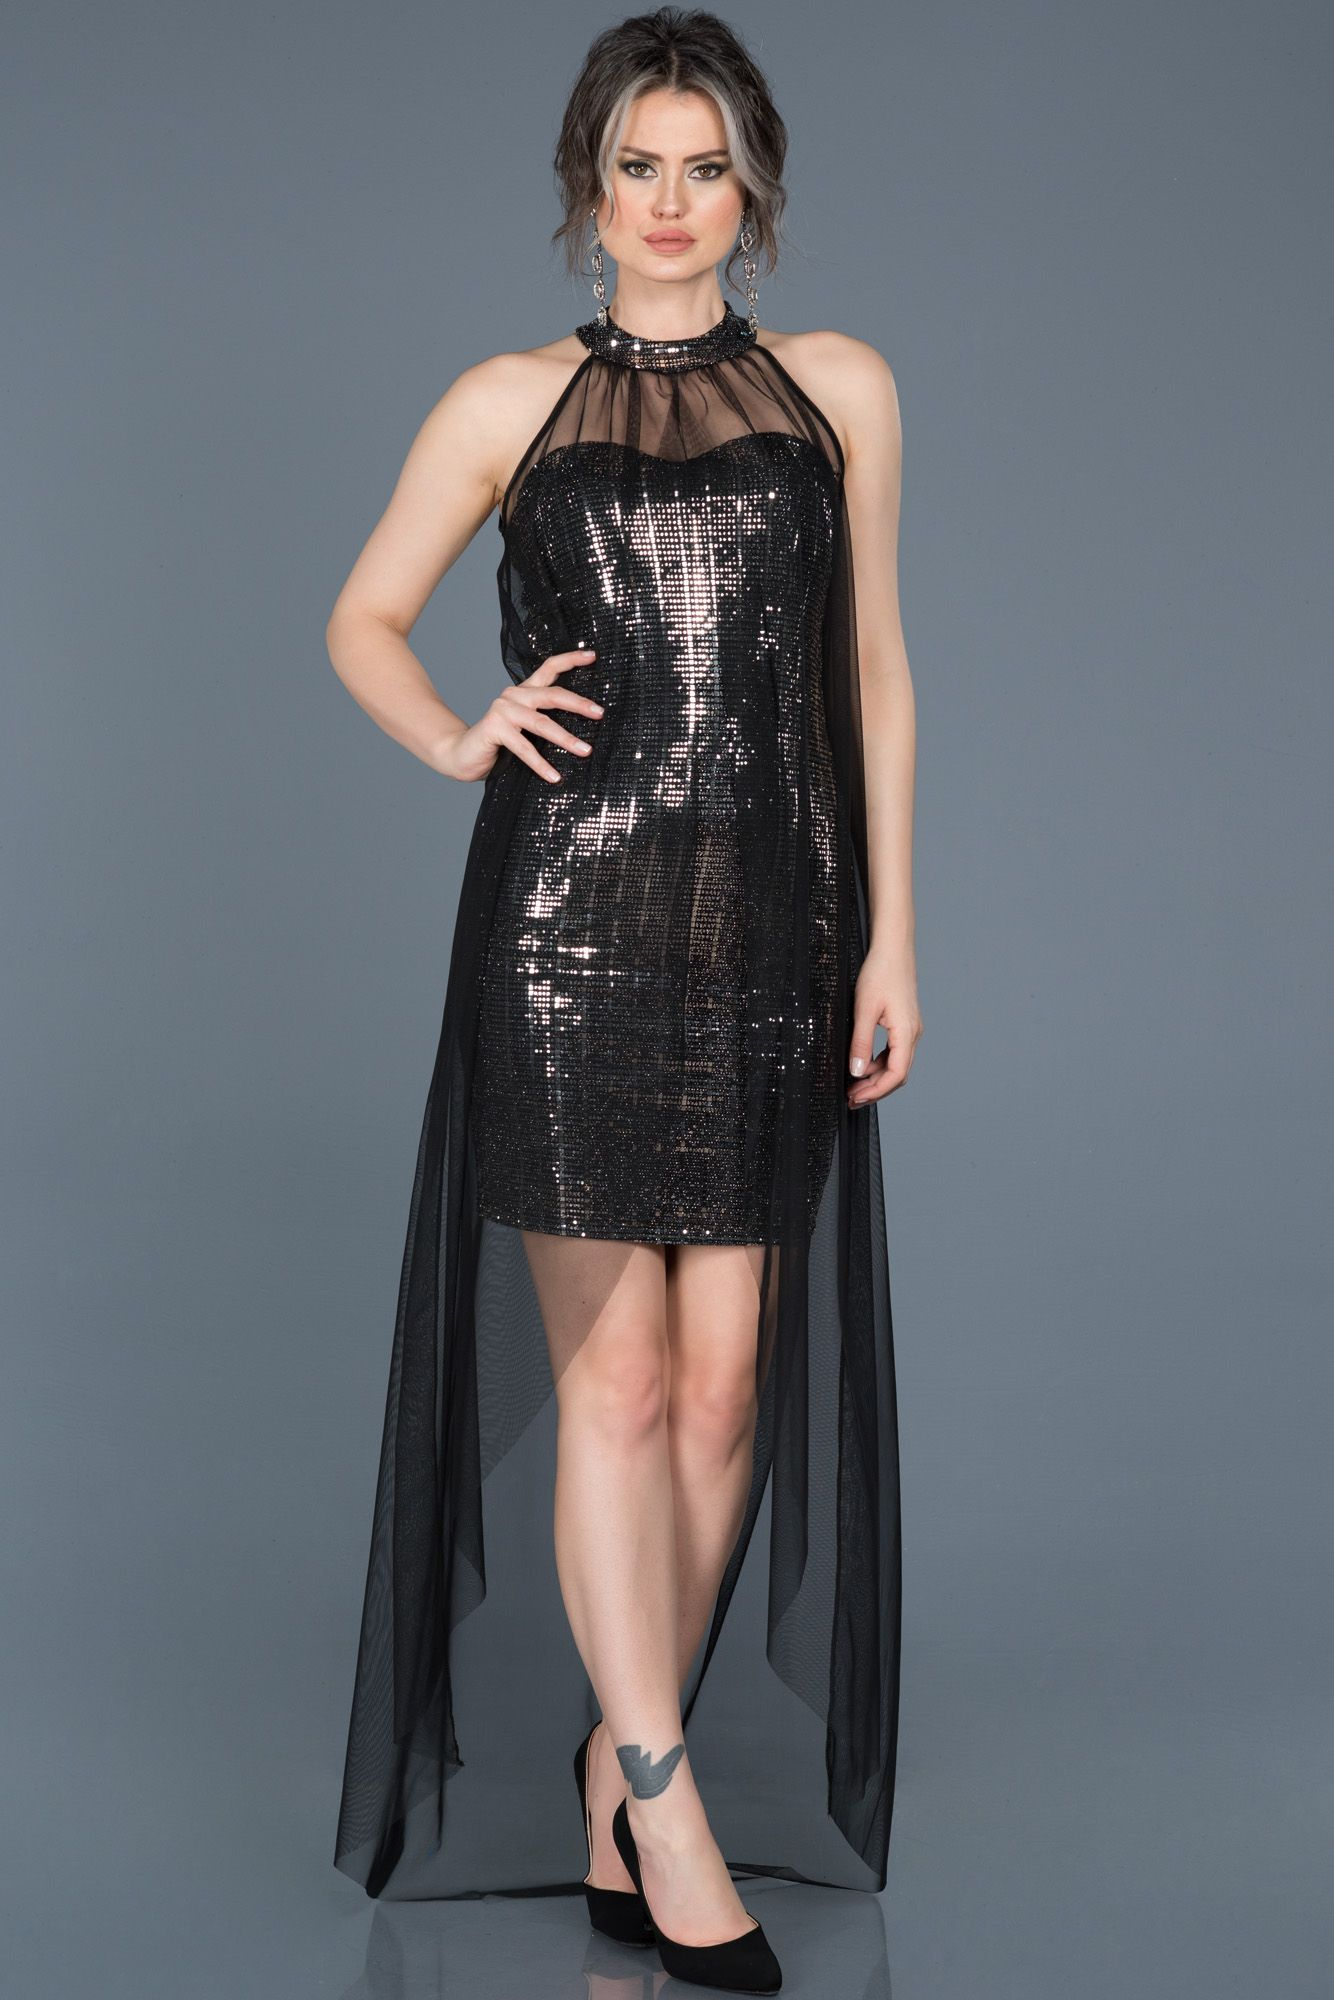 1b459c4ee2a90 #gece elbise, #night dresses, #kısa elbise, #2019 abiye modelleri, #night  dresses, #evening dresses #short, #siyah, #black, #gümüs, #silvery, #tül,  #tulle, ...